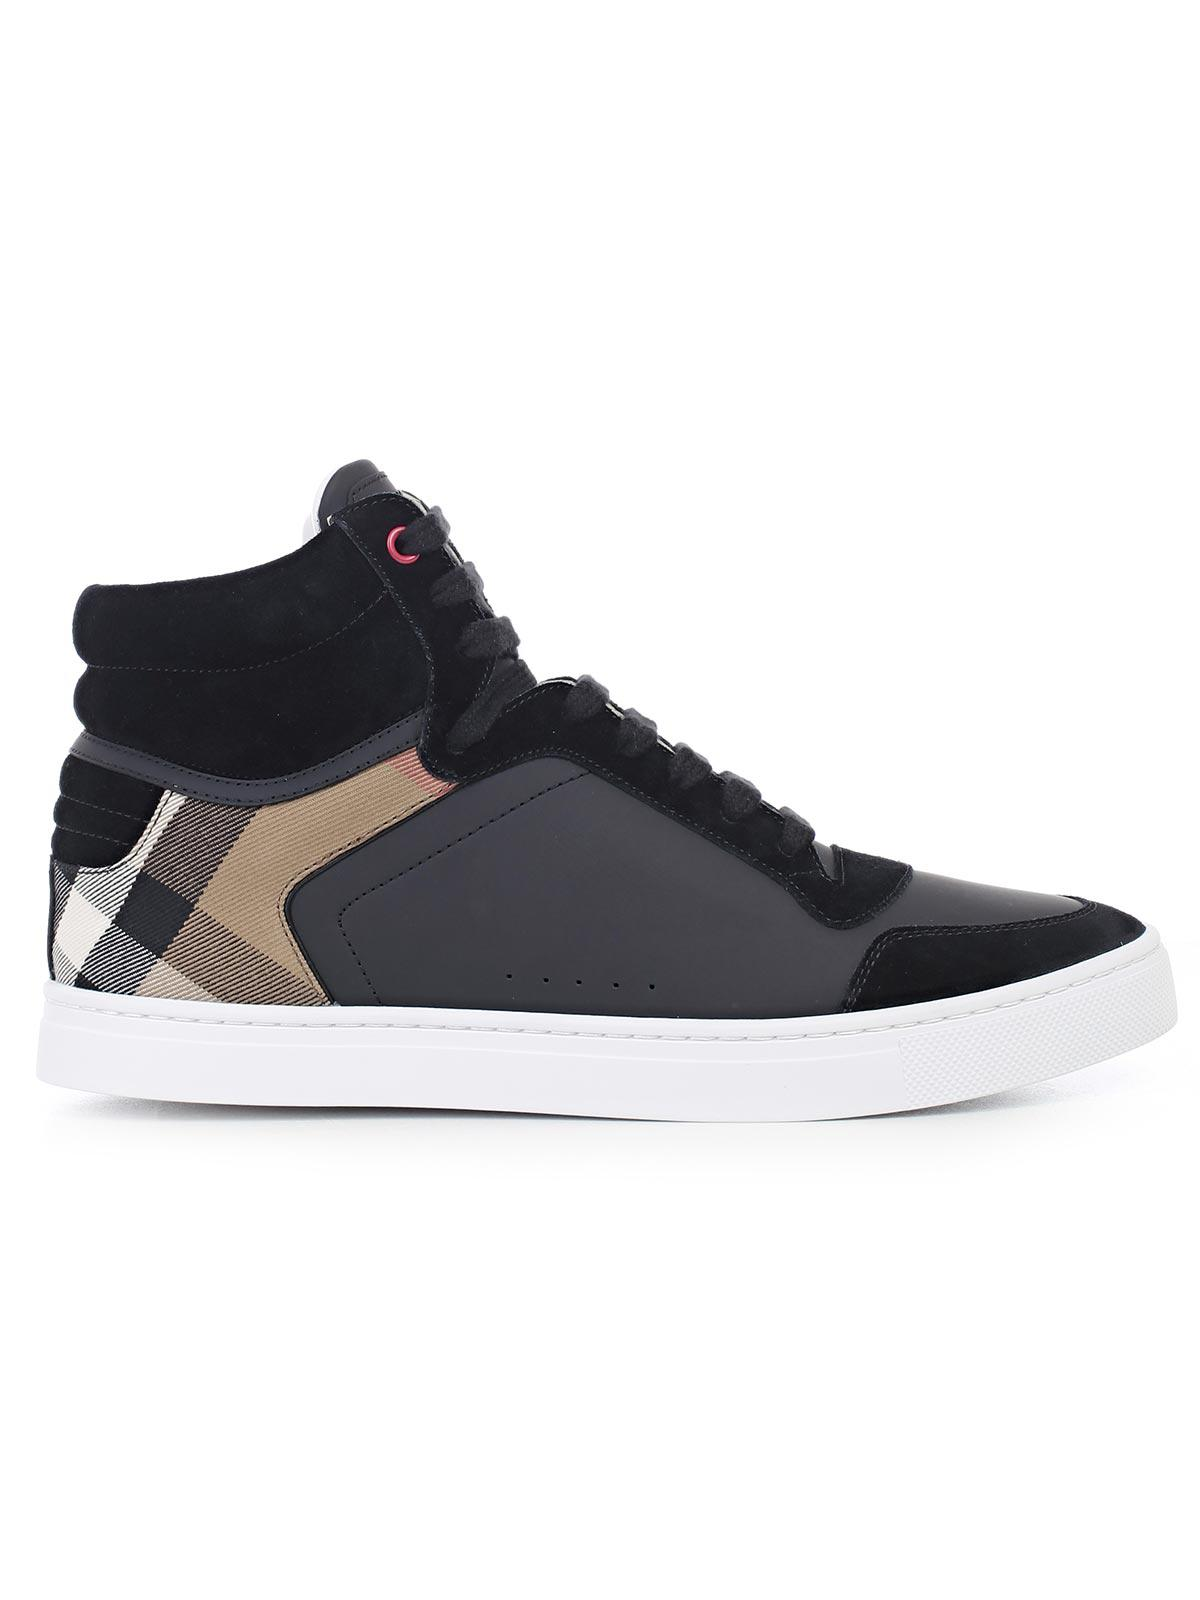 Archive Logo hi-top sneakers - Black Burberry Oqjqid